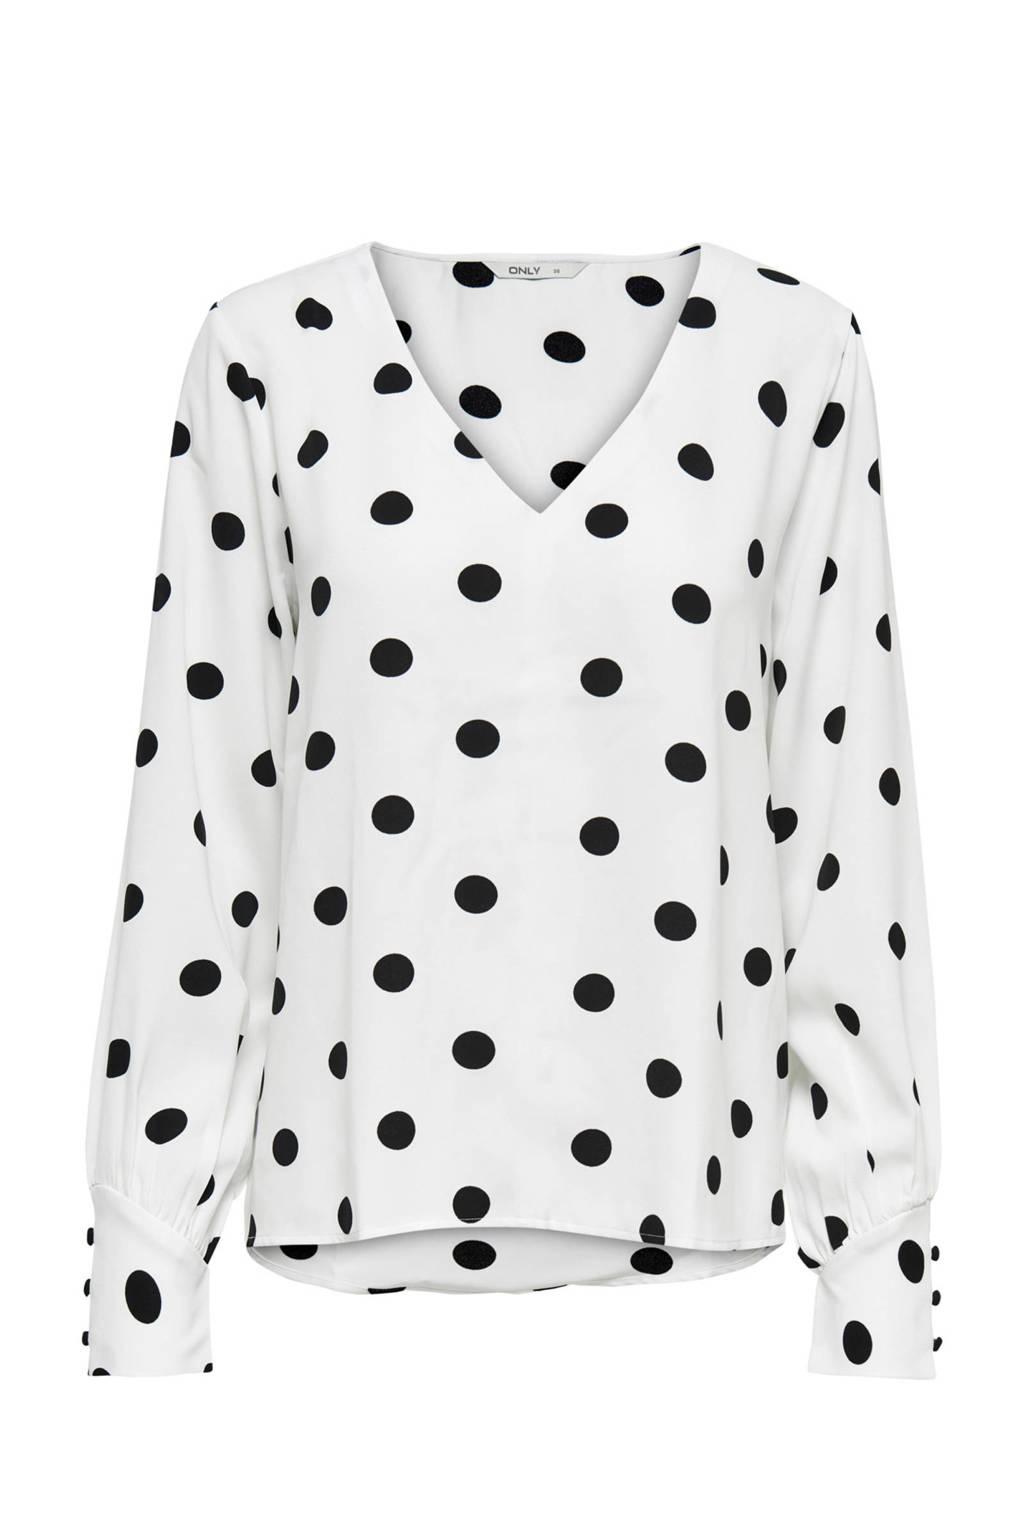 ONLY blouse met stippen, wit/ zwart